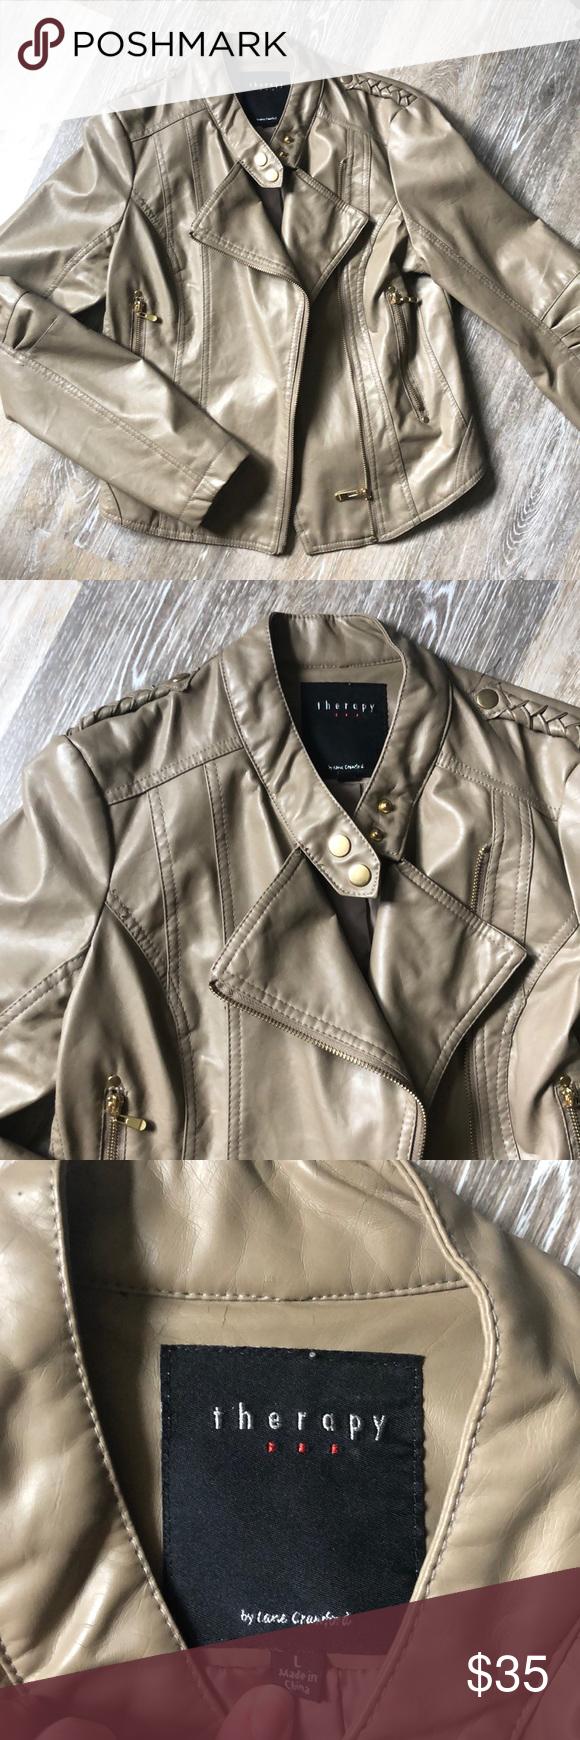 Tan Faux Leather Jacket Tan Faux Leather Jacket Leather Jacket Faux Leather Jackets [ 1740 x 580 Pixel ]